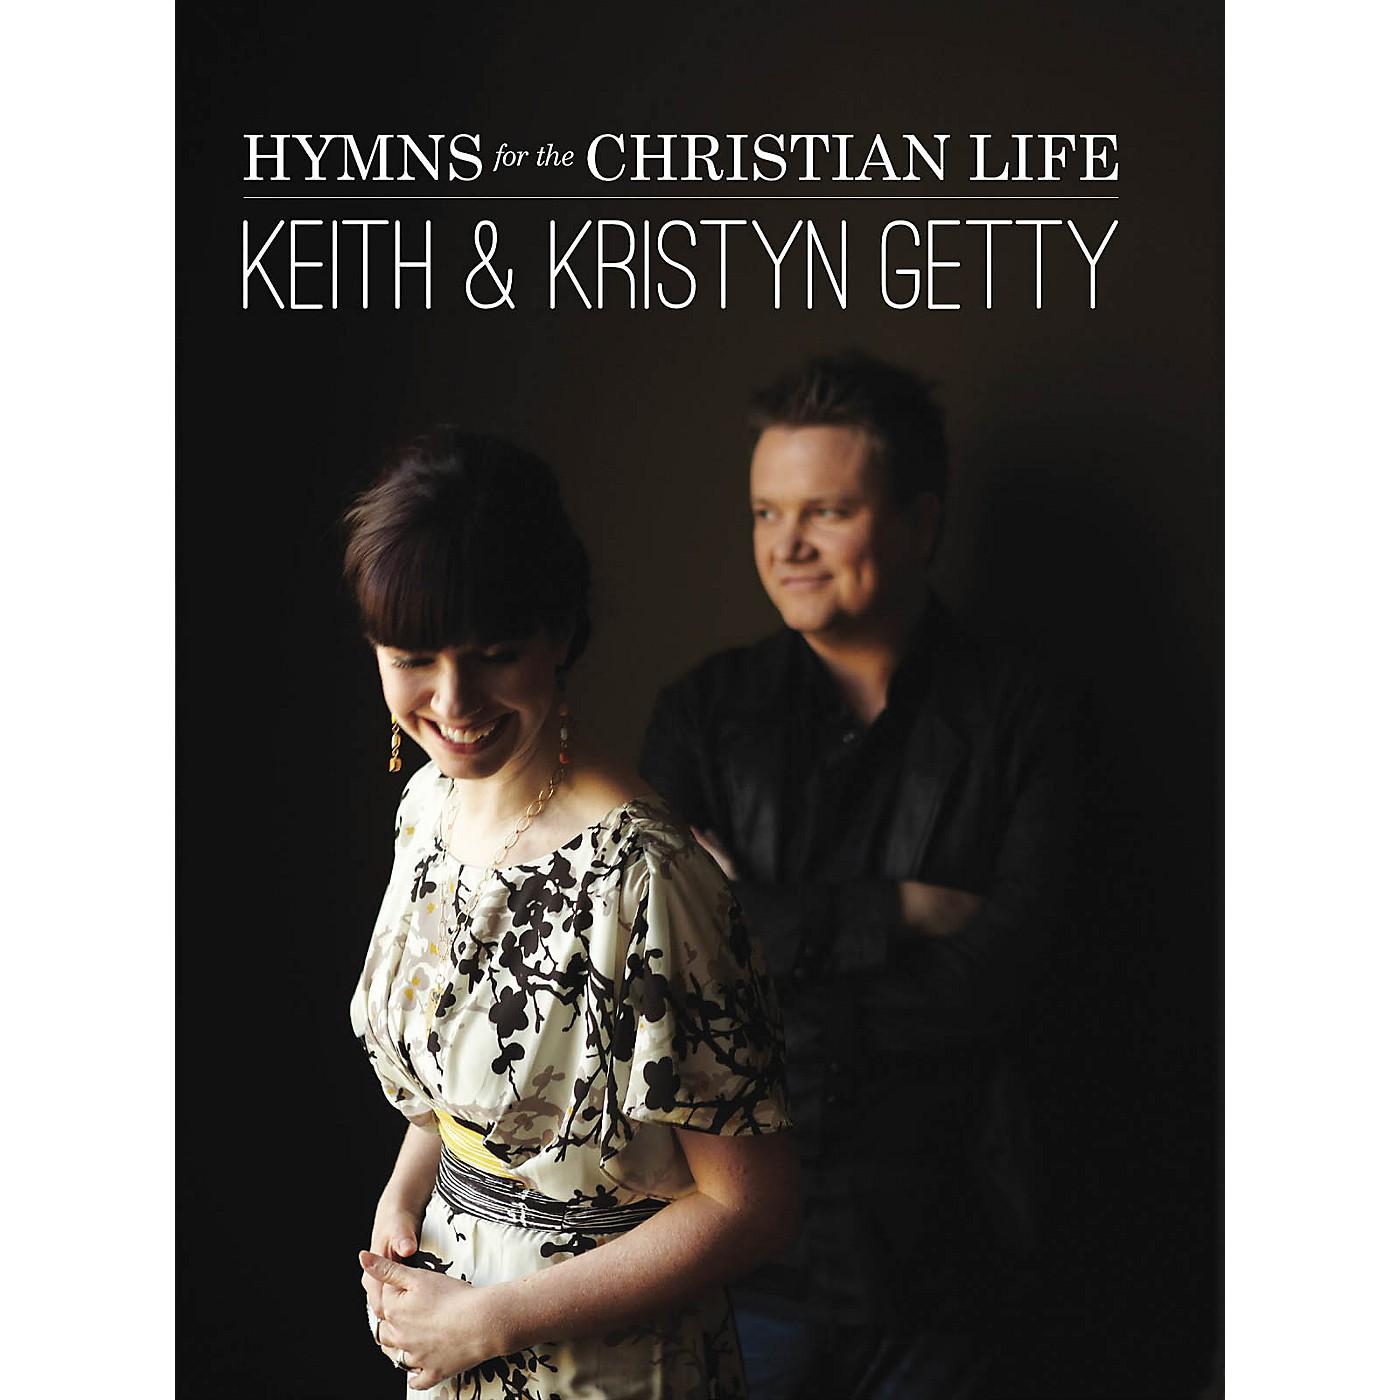 Hal Leonard Keith & Kristyn Getty - Hymns for the Christian Life Sacred Folio Series by Keith & Kristyn Getty thumbnail